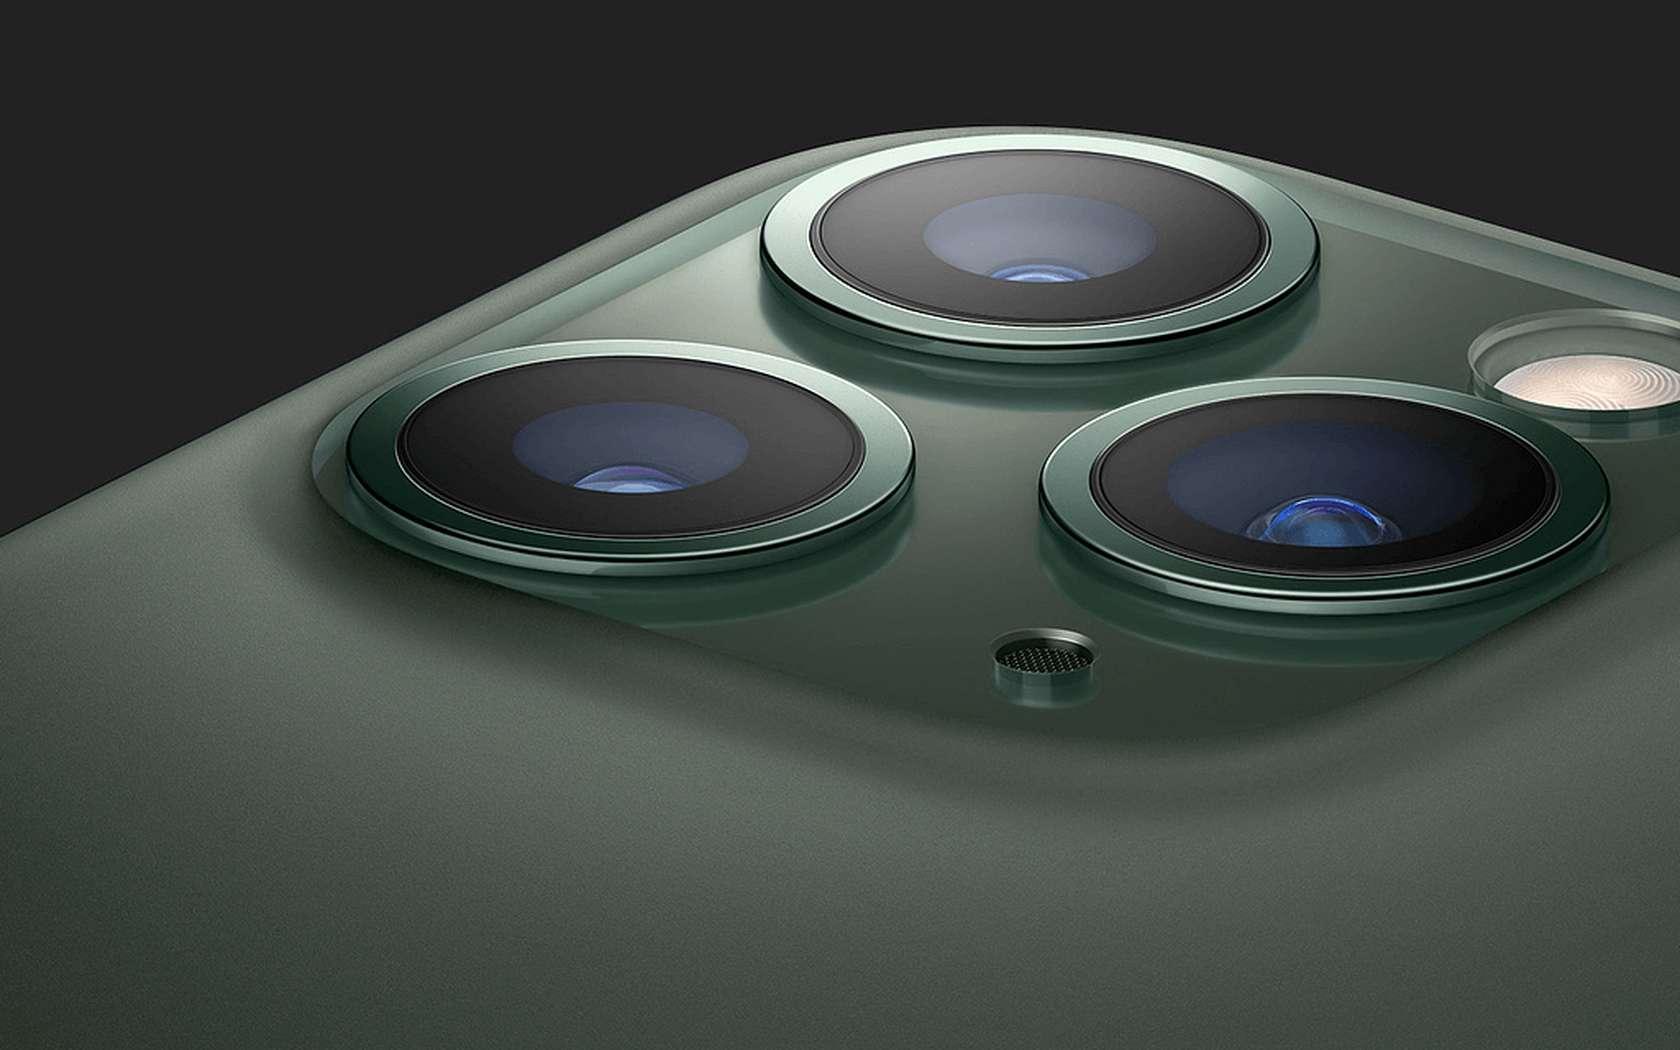 Offre SFR : l'iPhone 11 Pro Max à 699 ¬